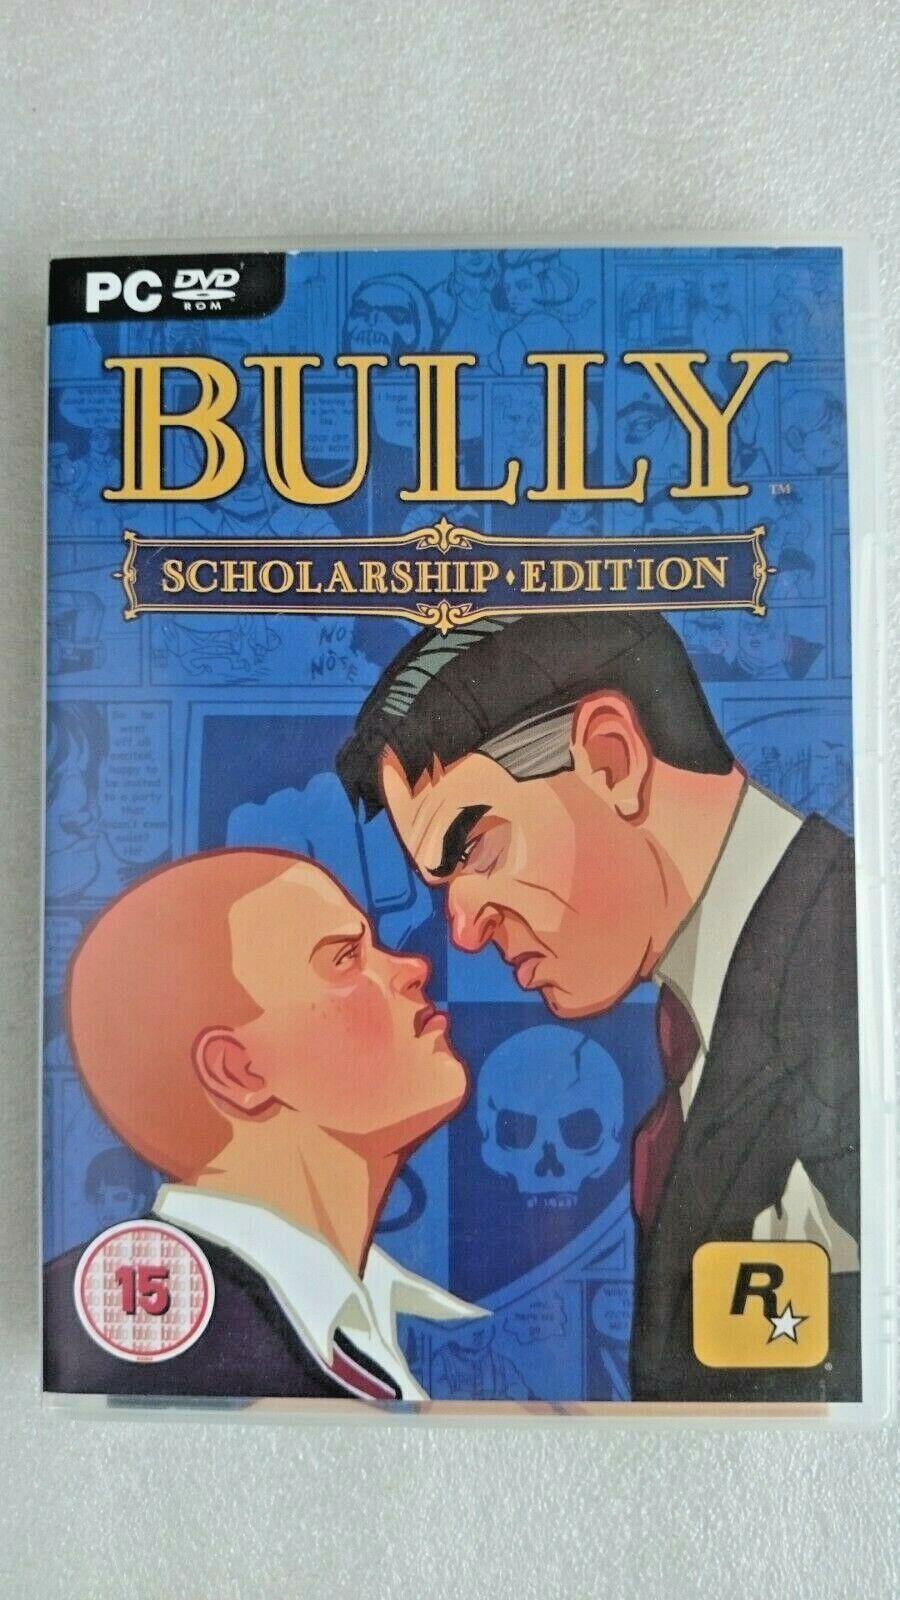 Bully: Scholarship Edition (PC Windows, 2008)